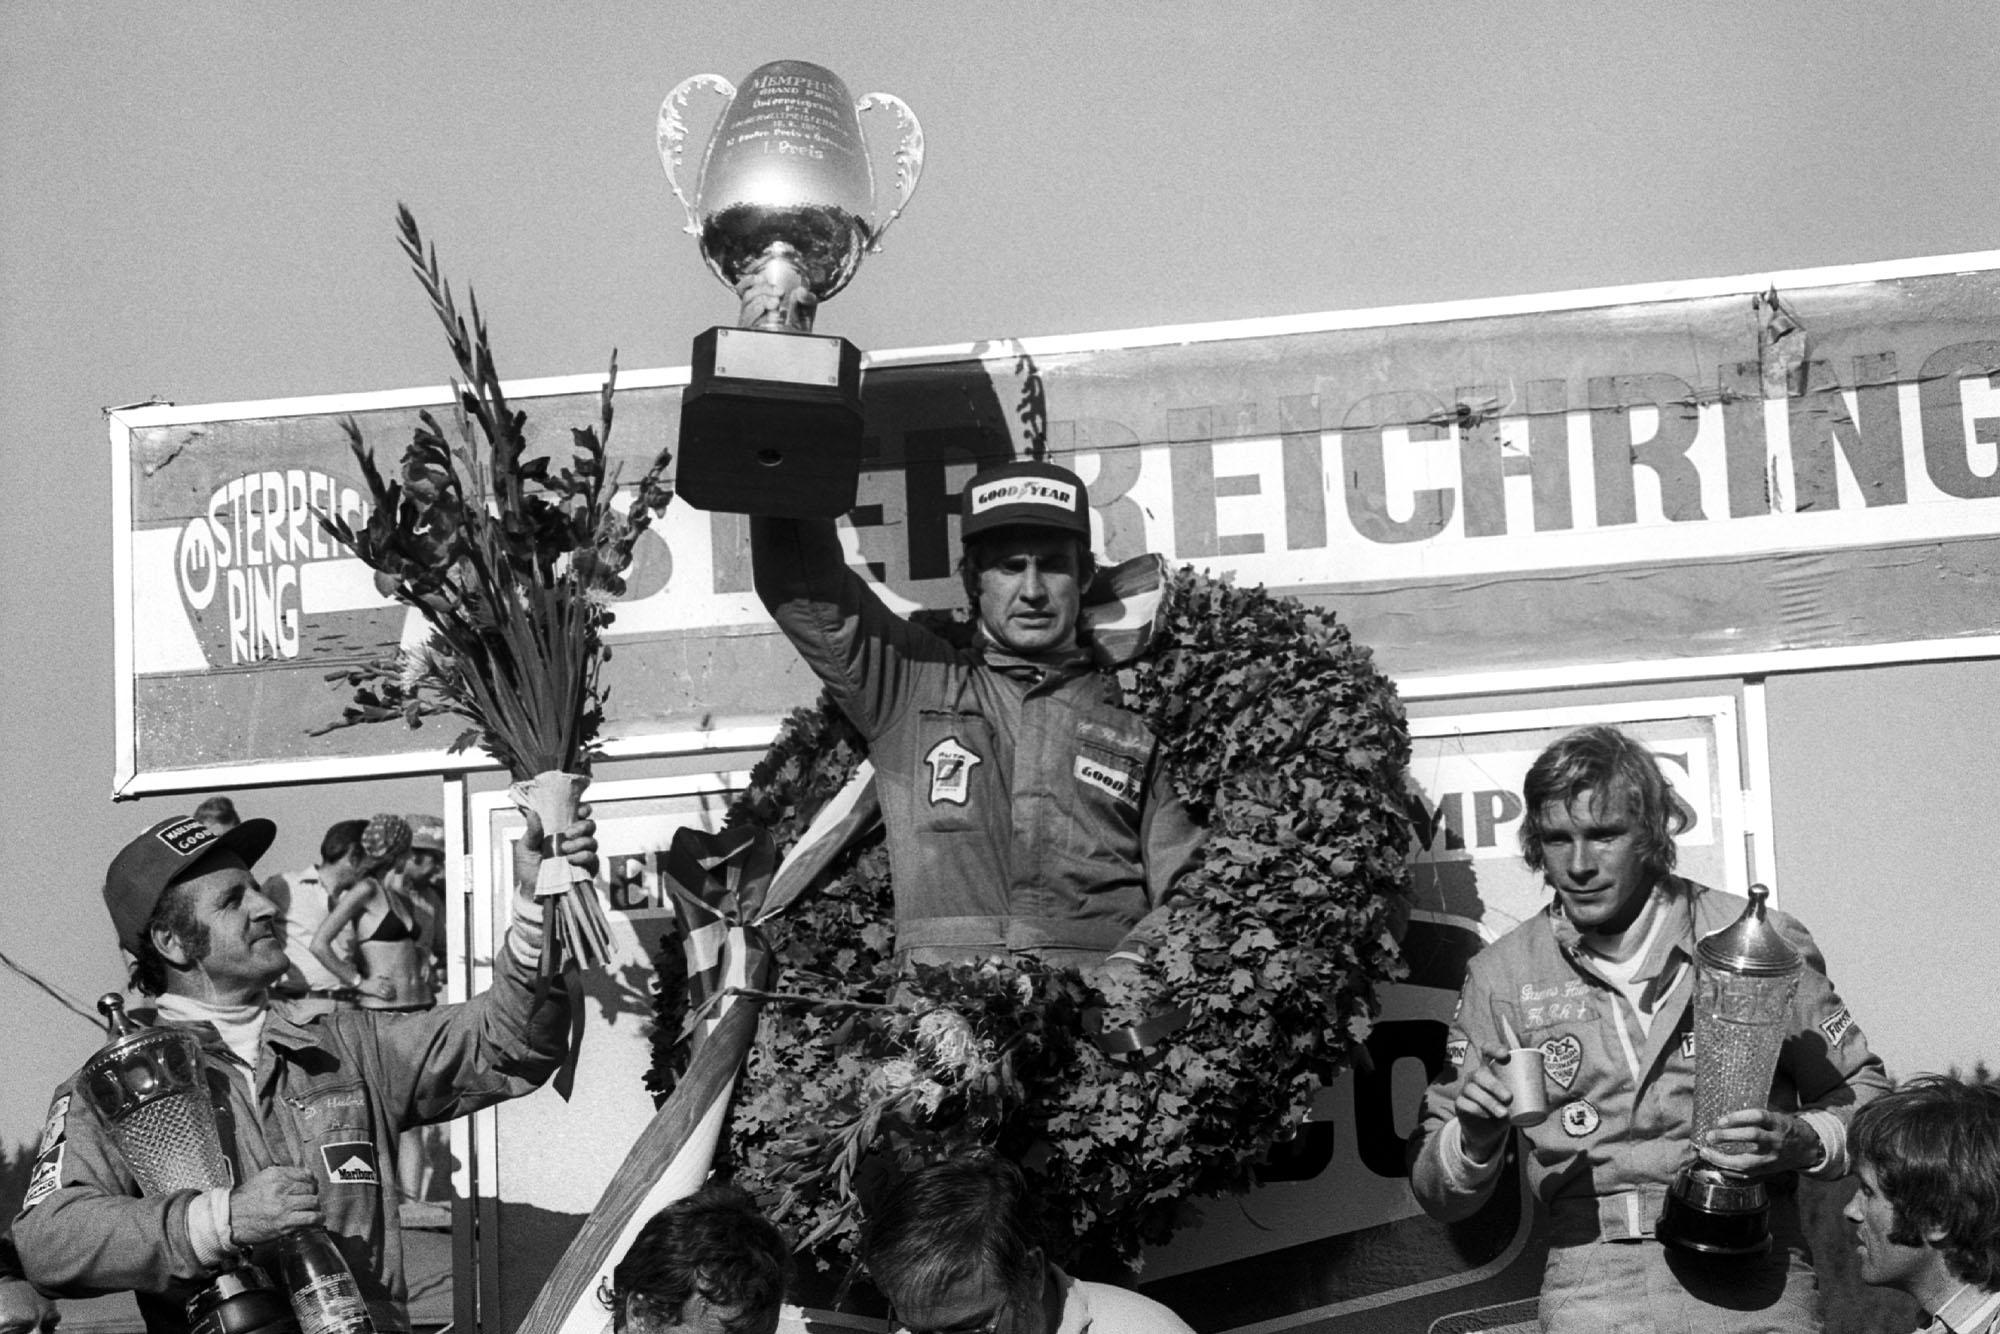 Carlos Reutemann (Brabham) holds his trophy aloft after winning the 1974 Austrian Grand Prix.